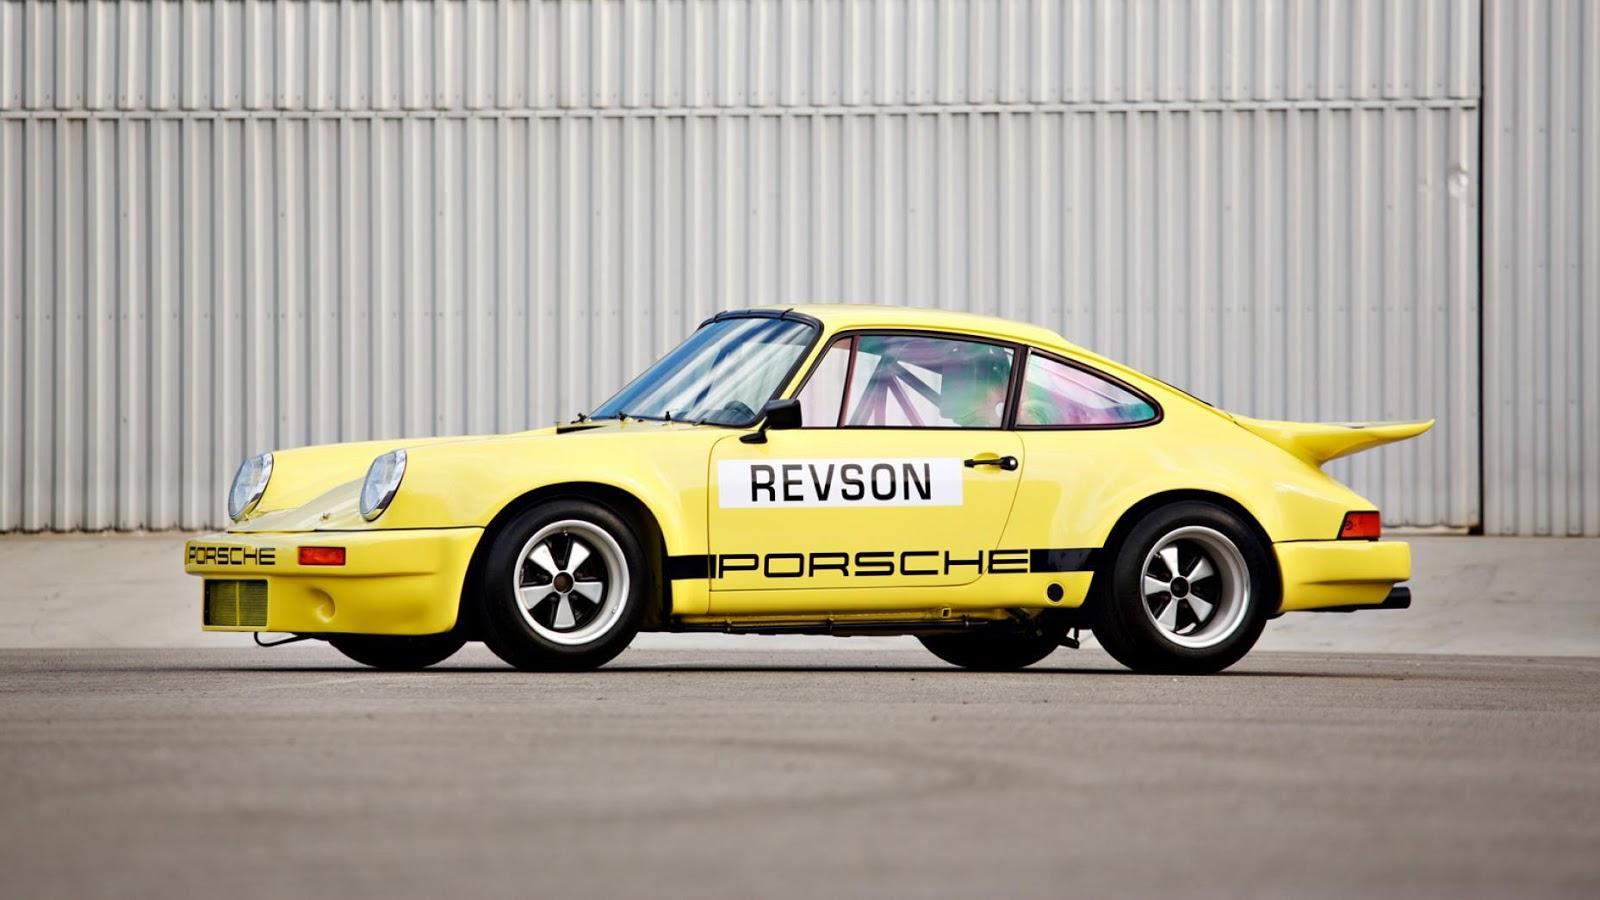 1974 Porsche 911 Carrera 3.0 IROC RSR Coupe $2,310,000